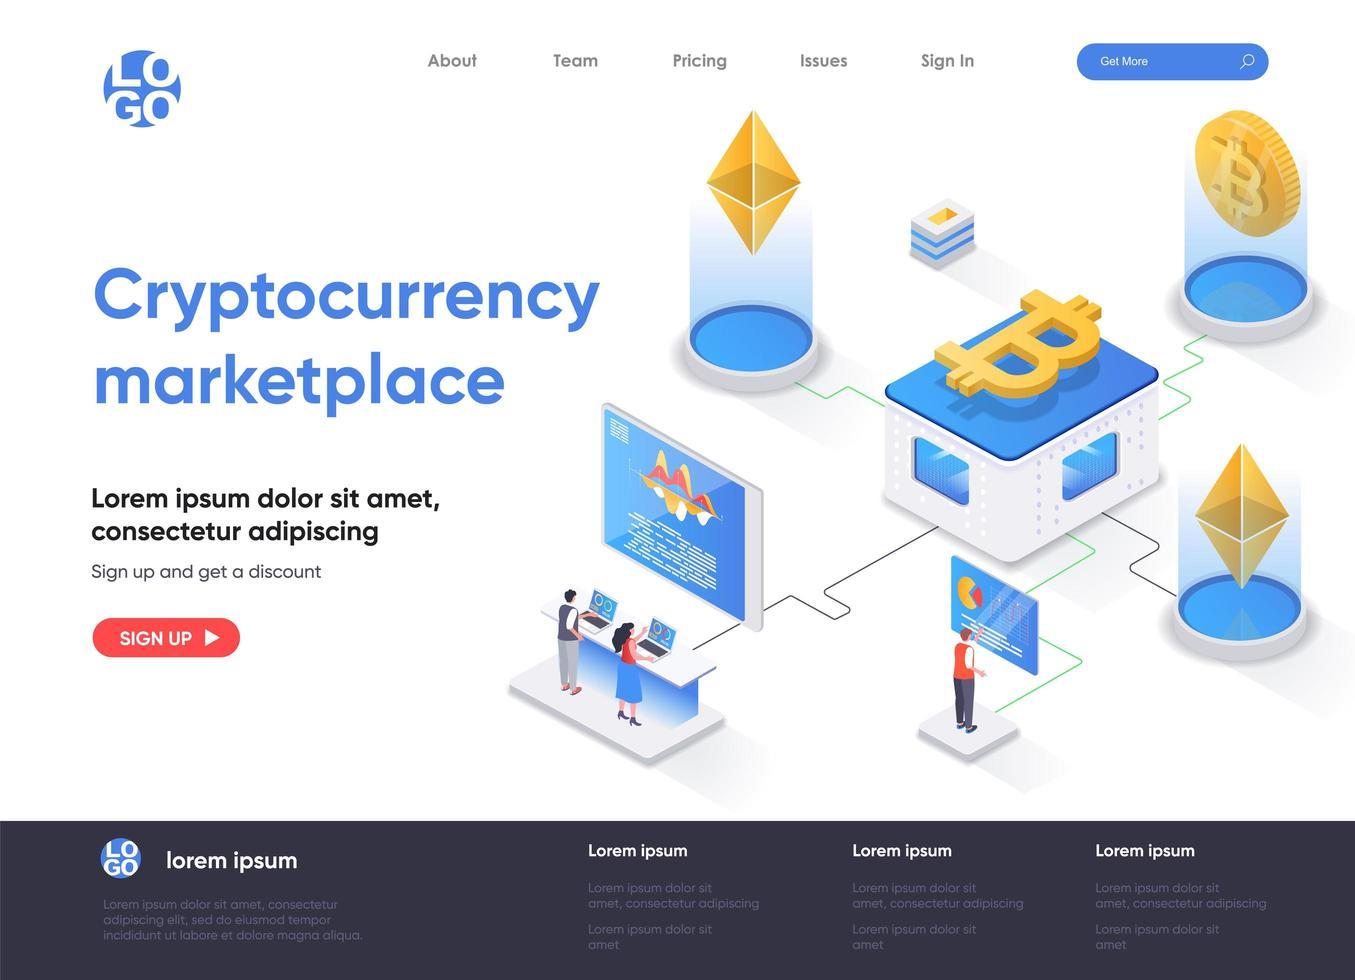 marketplace cryptocurrence)